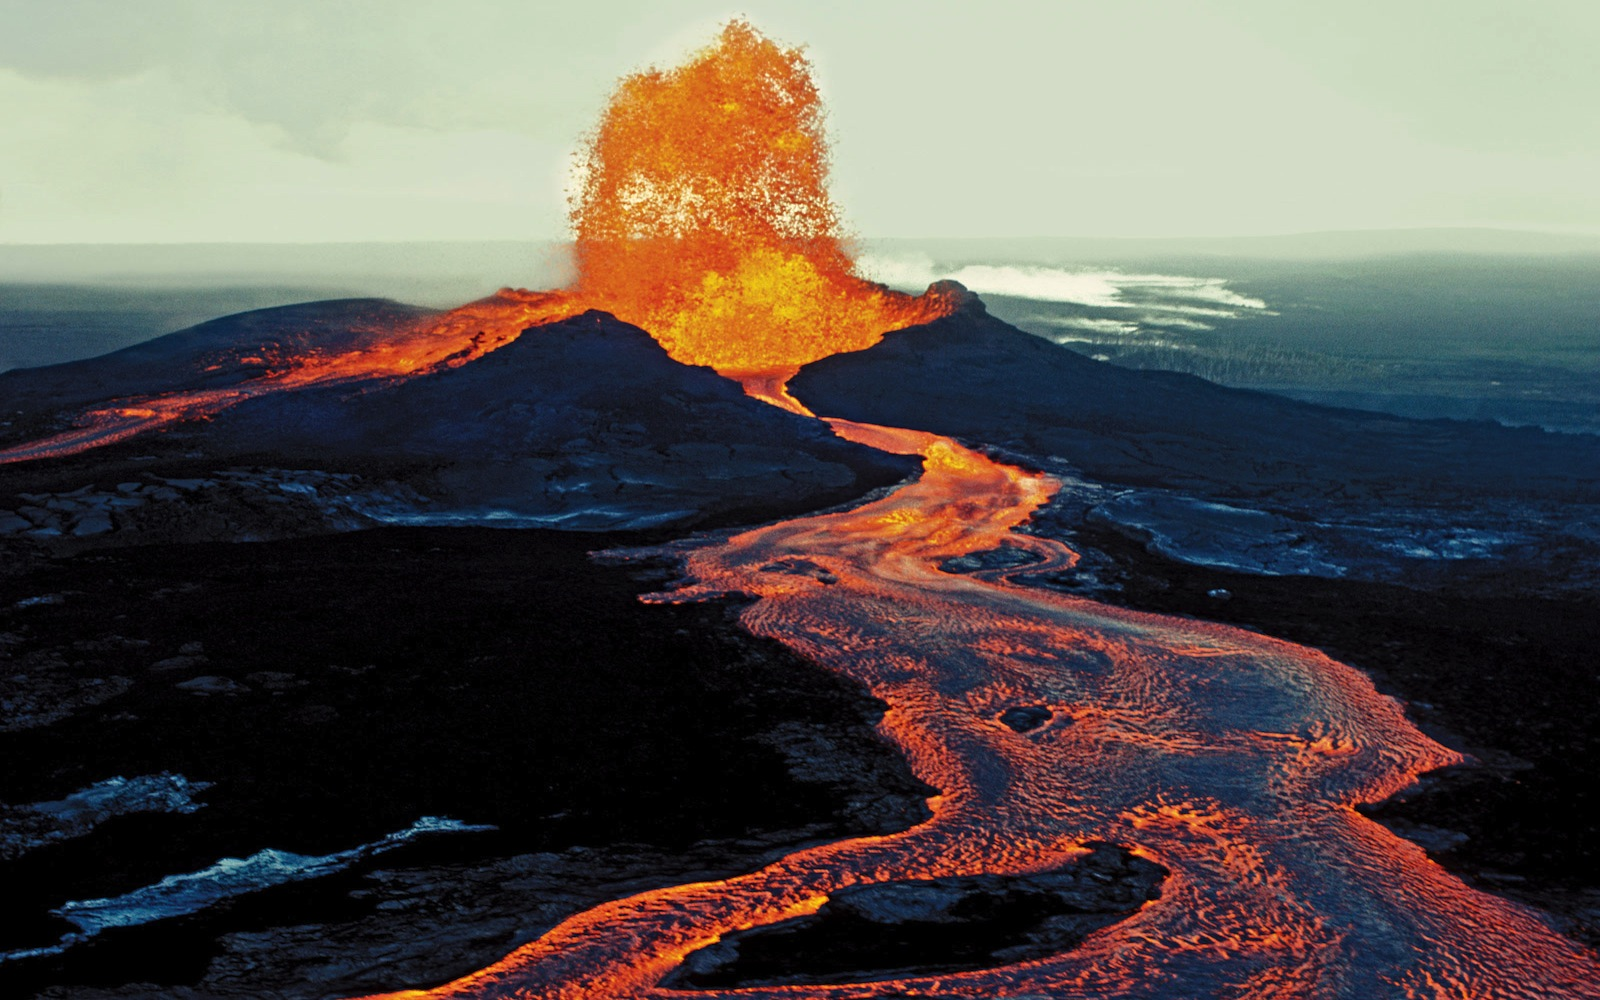 volcano-diagram-wallpaper-2